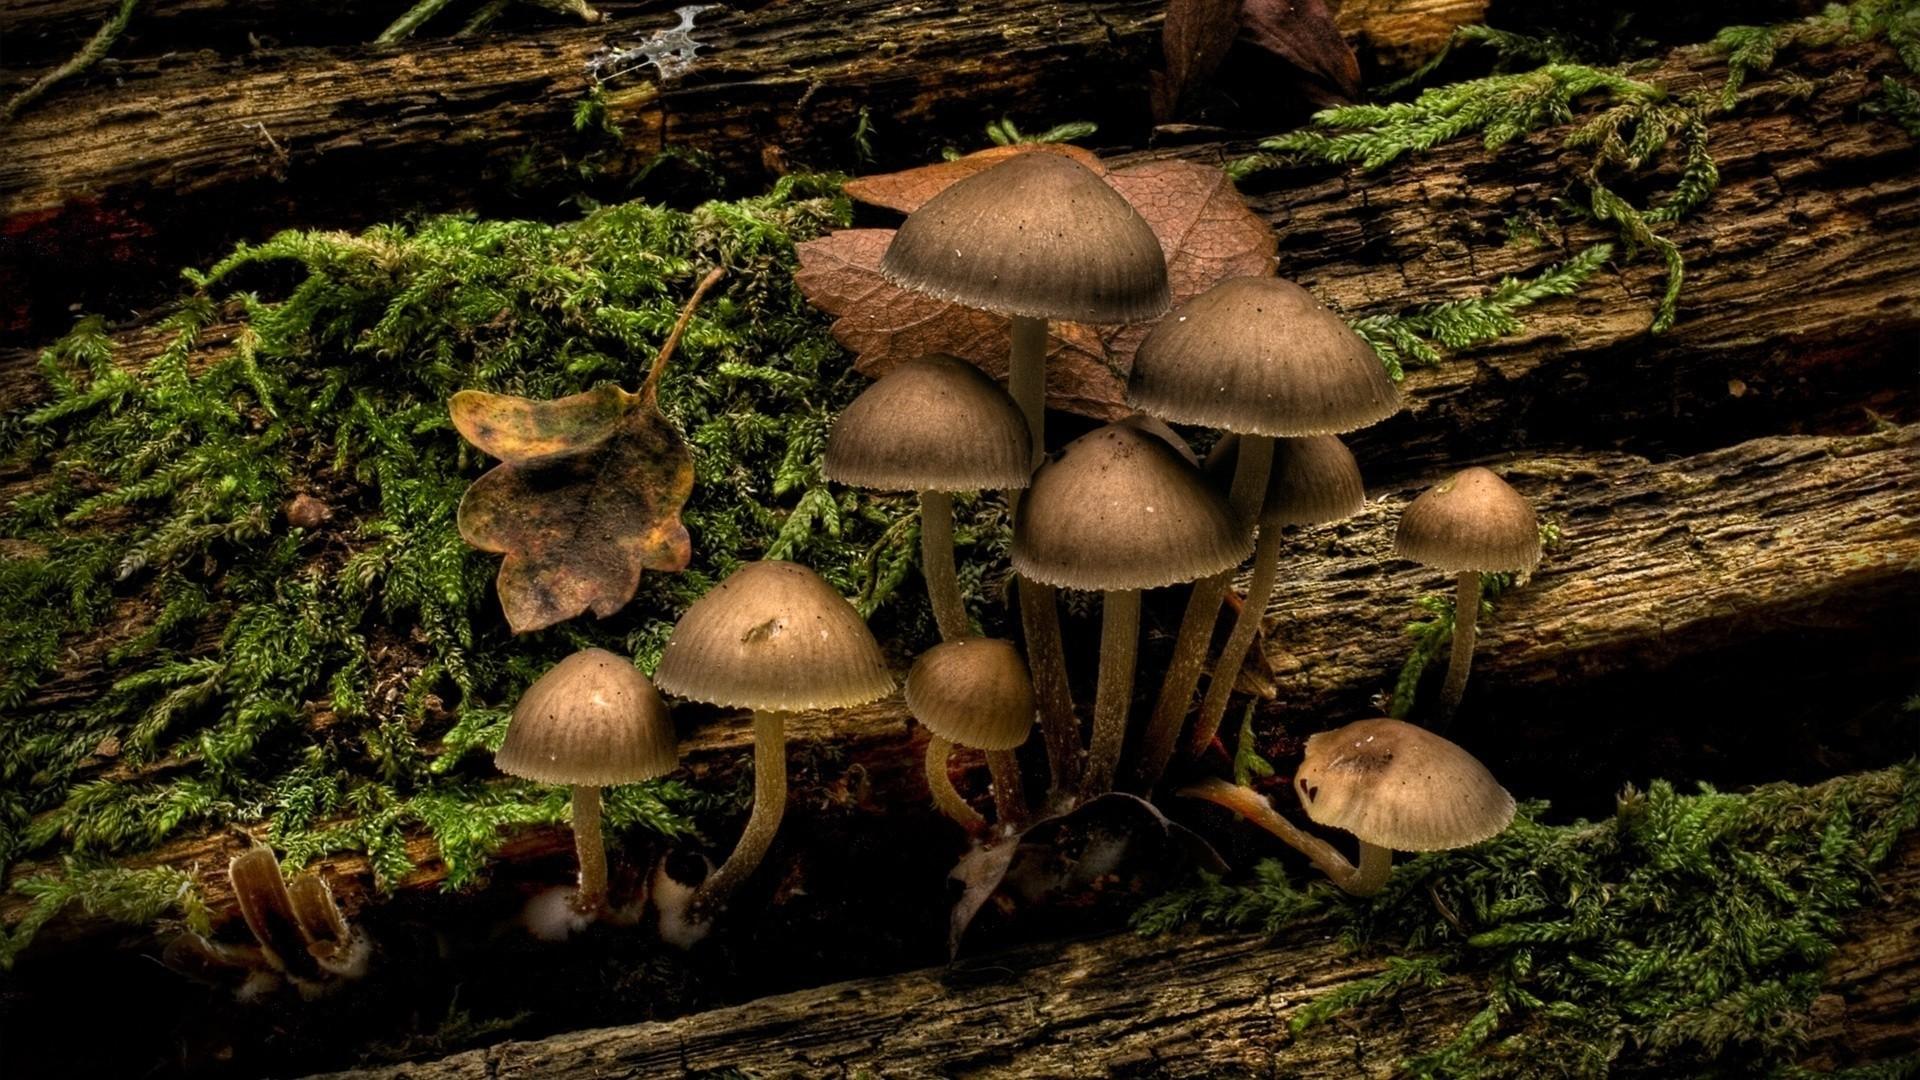 Mushroom Download Wallpaper